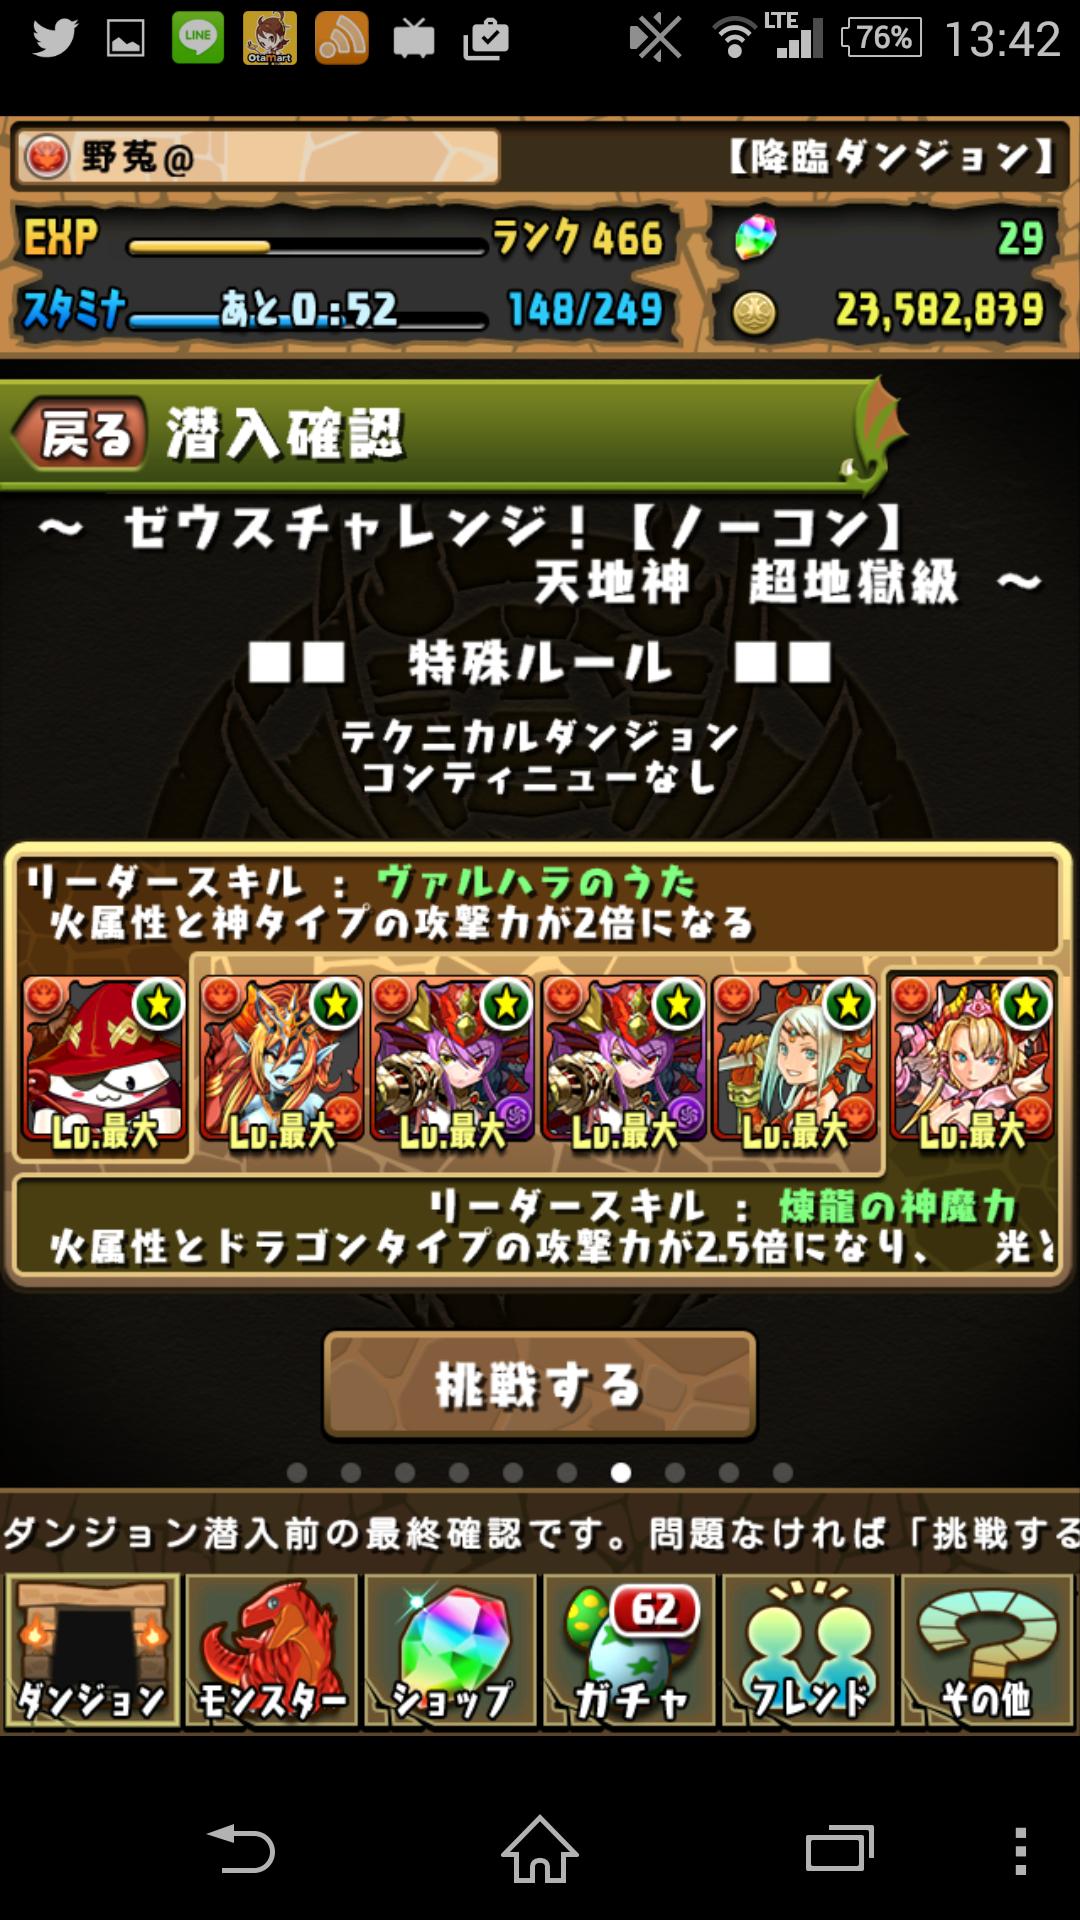 Screenshot_2015-02-18-13-42-48.png